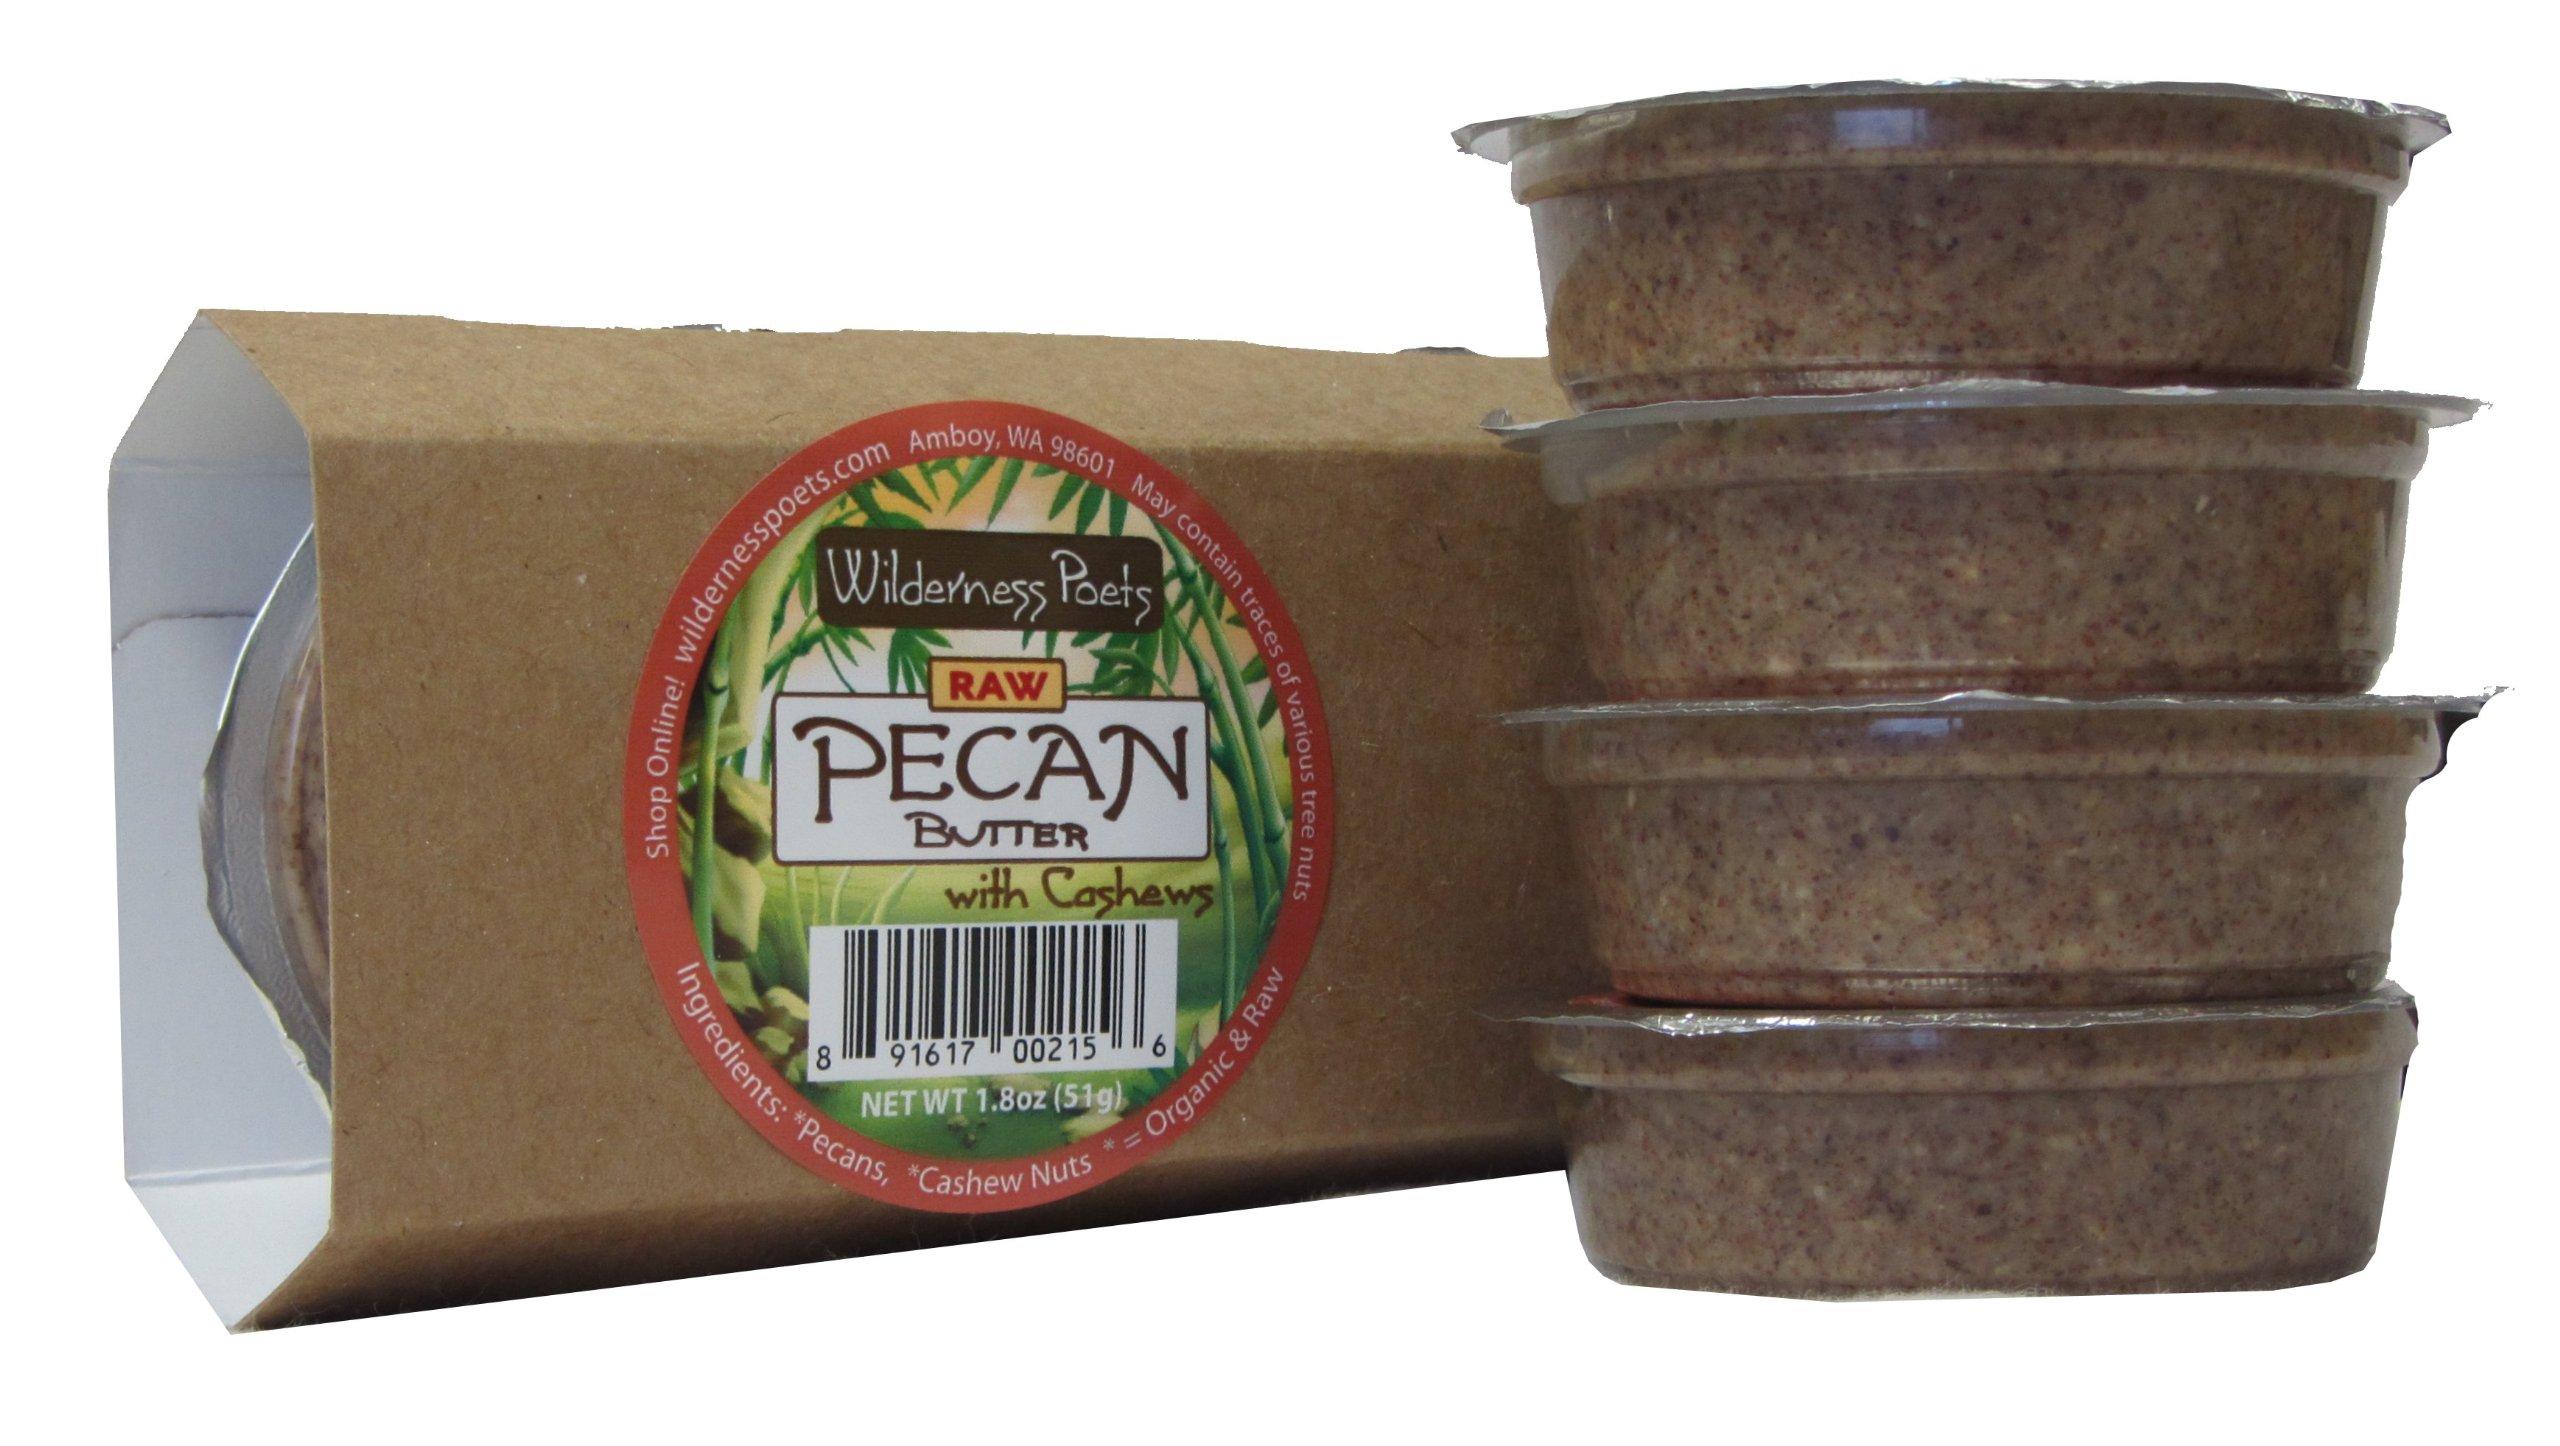 Wilderness Poets Pecan Butter Snackers - Organic & Raw (4 X 1.8 Oz Cups)